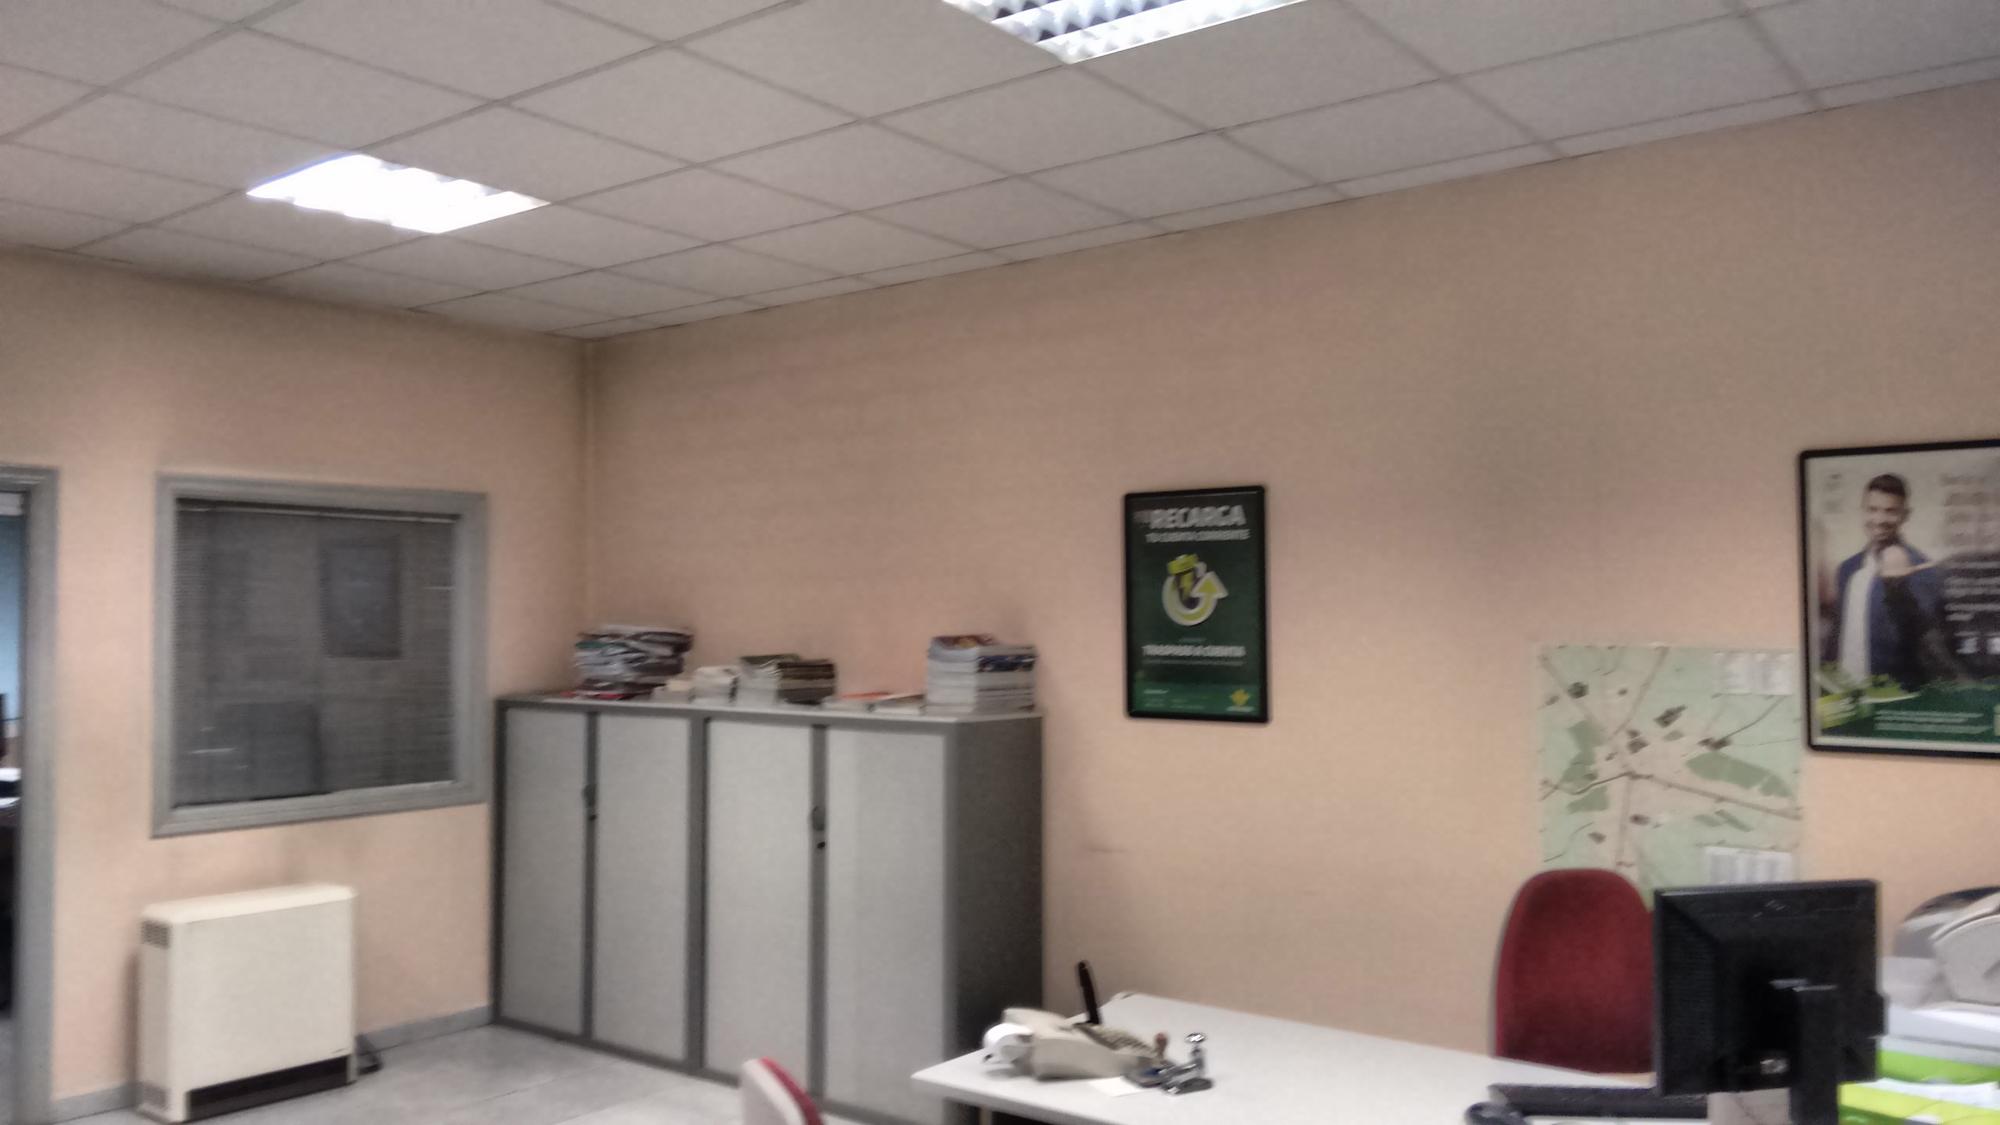 helper-oficinas-caixa-rural-melide-antes-03